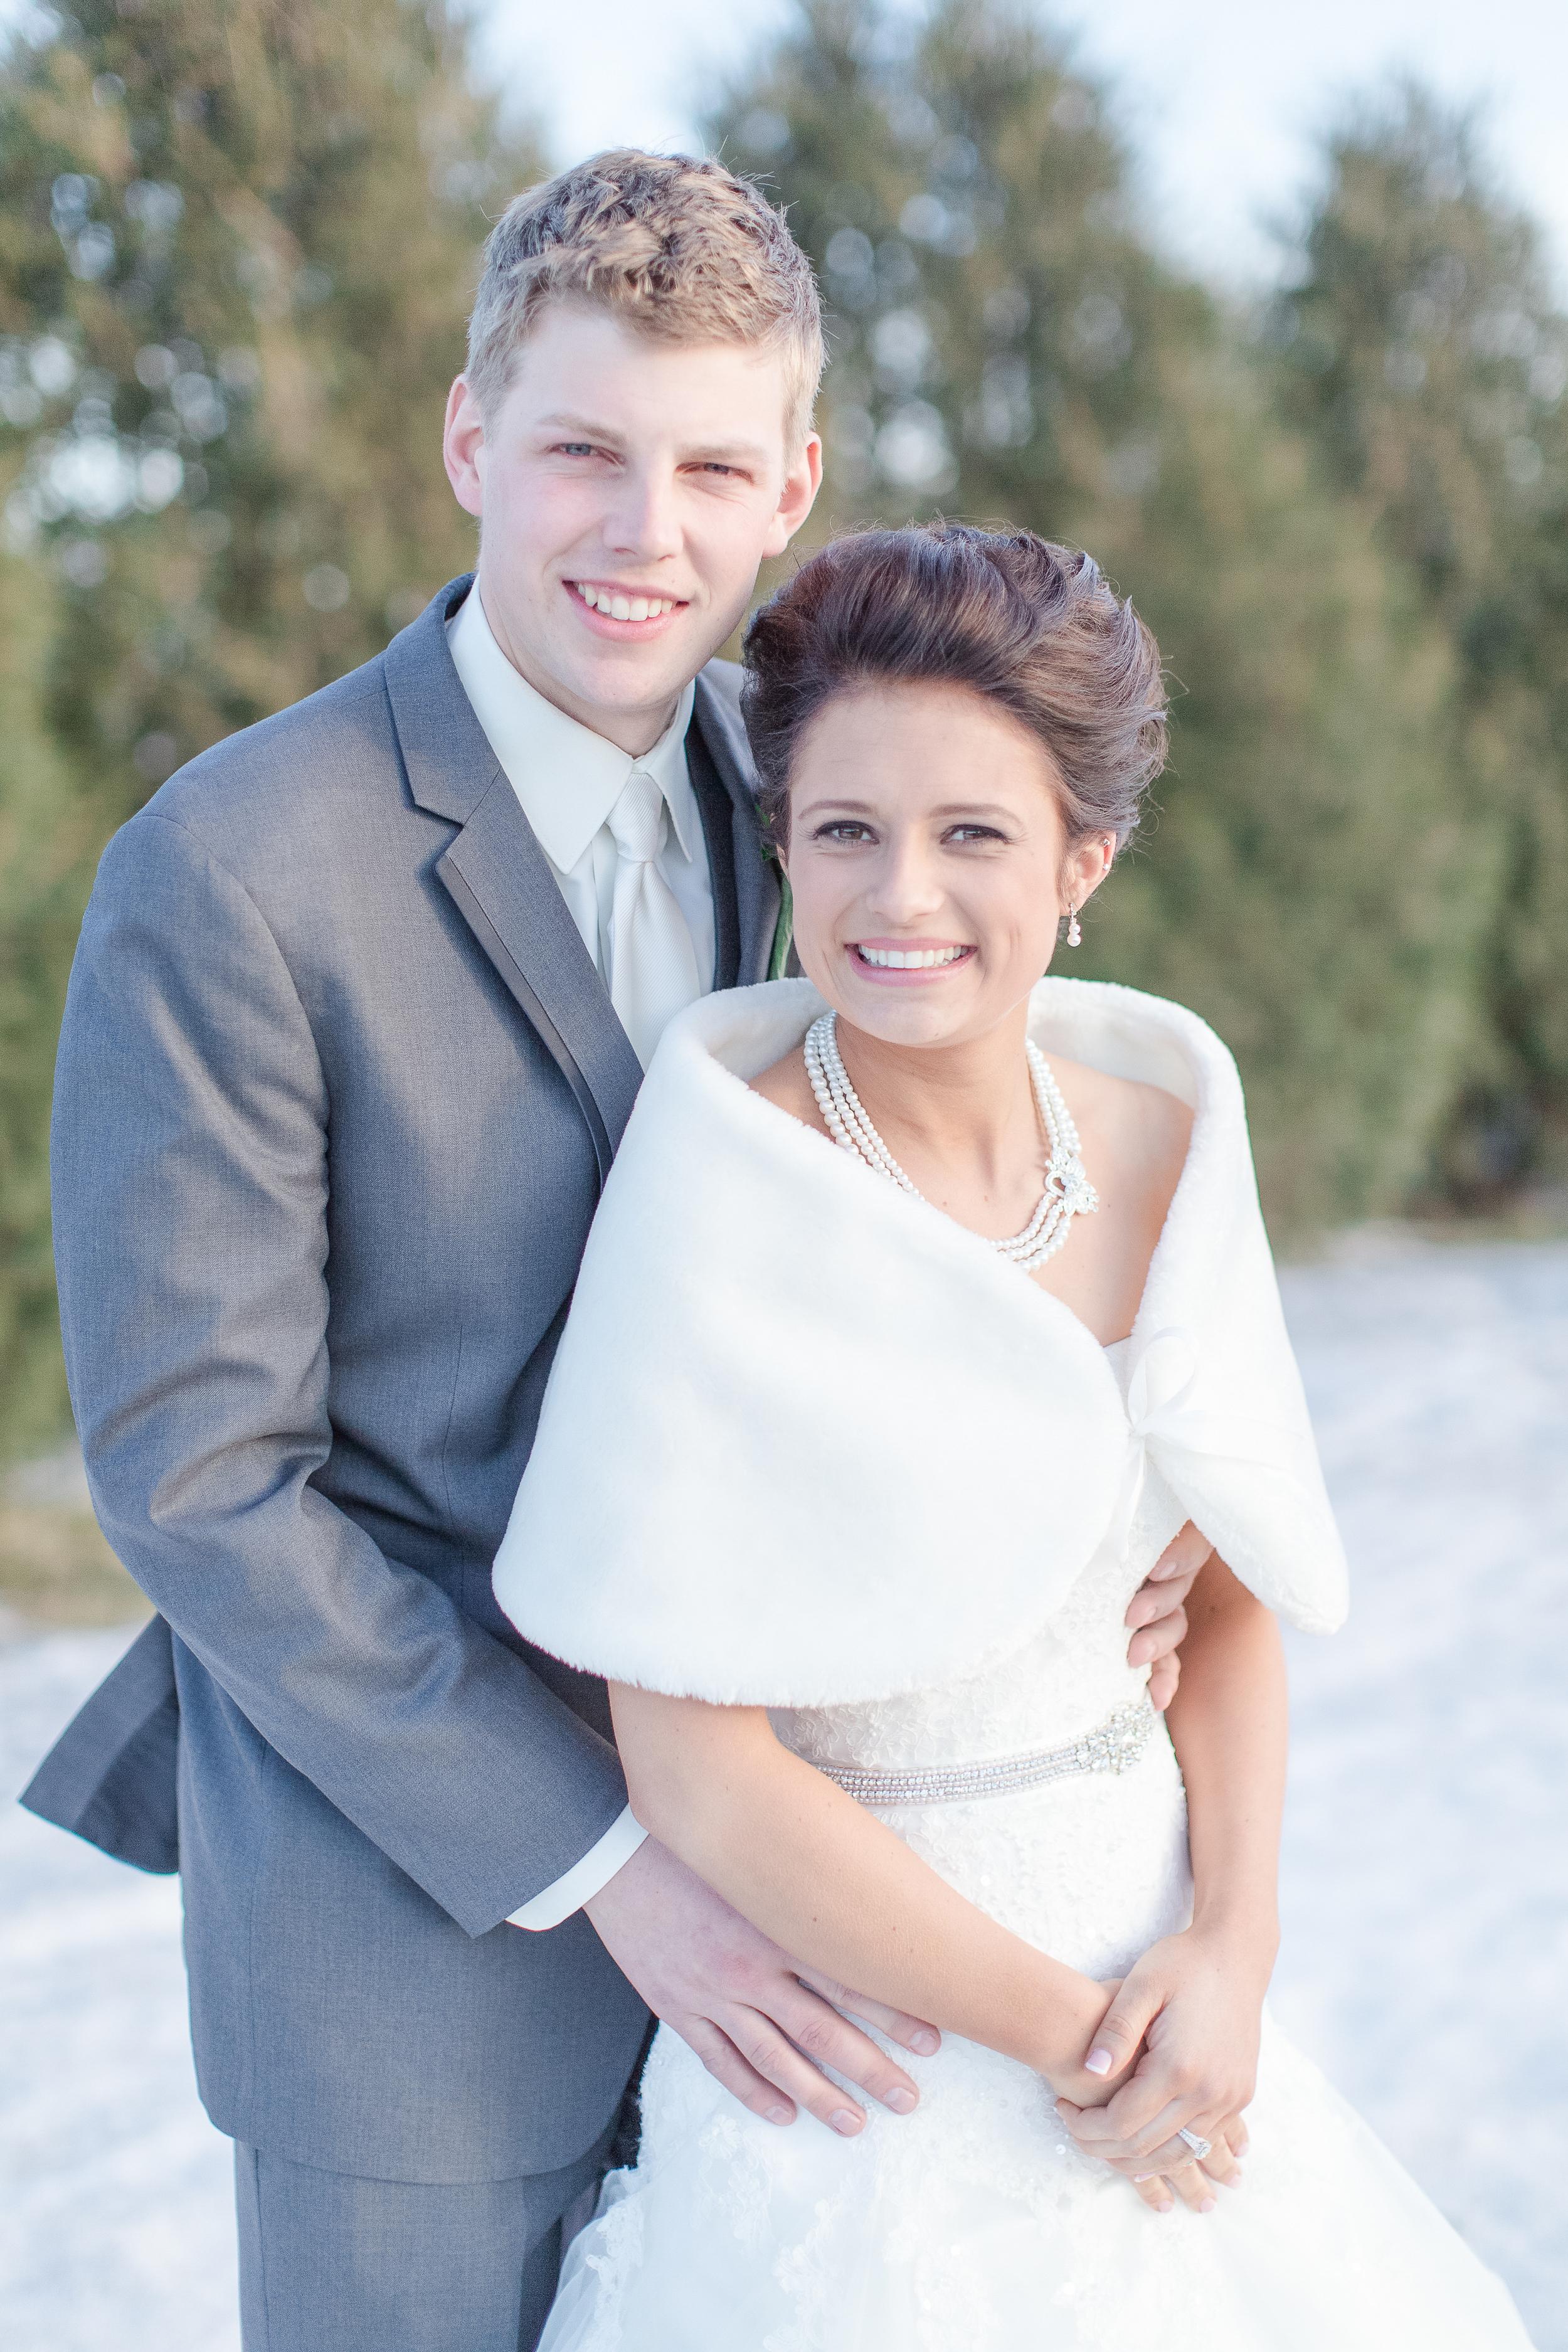 #brideandgroom #mnwedding #winterwedding #mnweddingphotographer